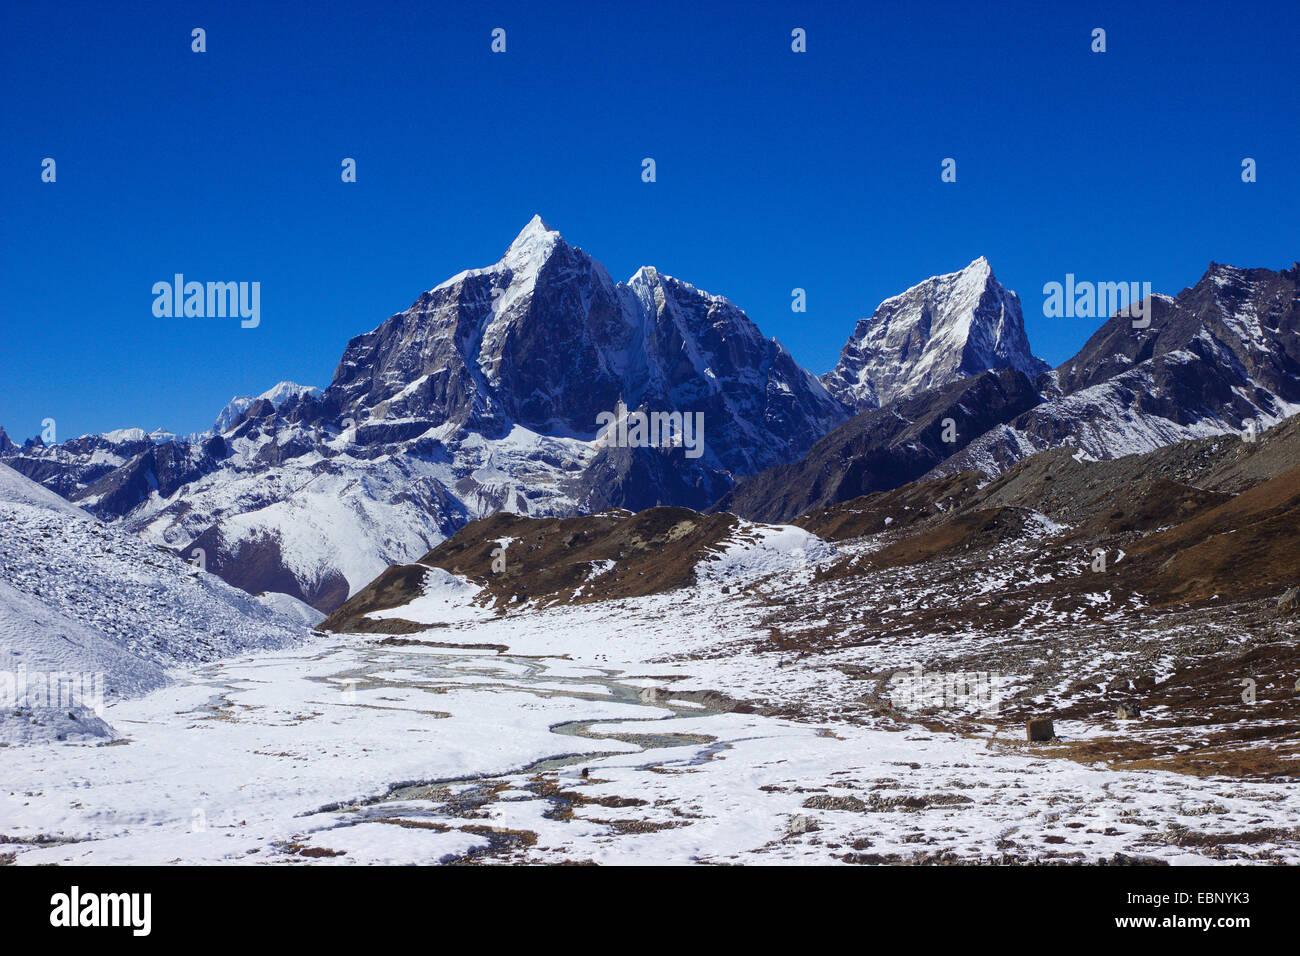 Taboche and Cholatse, view from ascent to Island Peak Base Camp, Nepal, Himalaya, Khumbu Himal - Stock Image